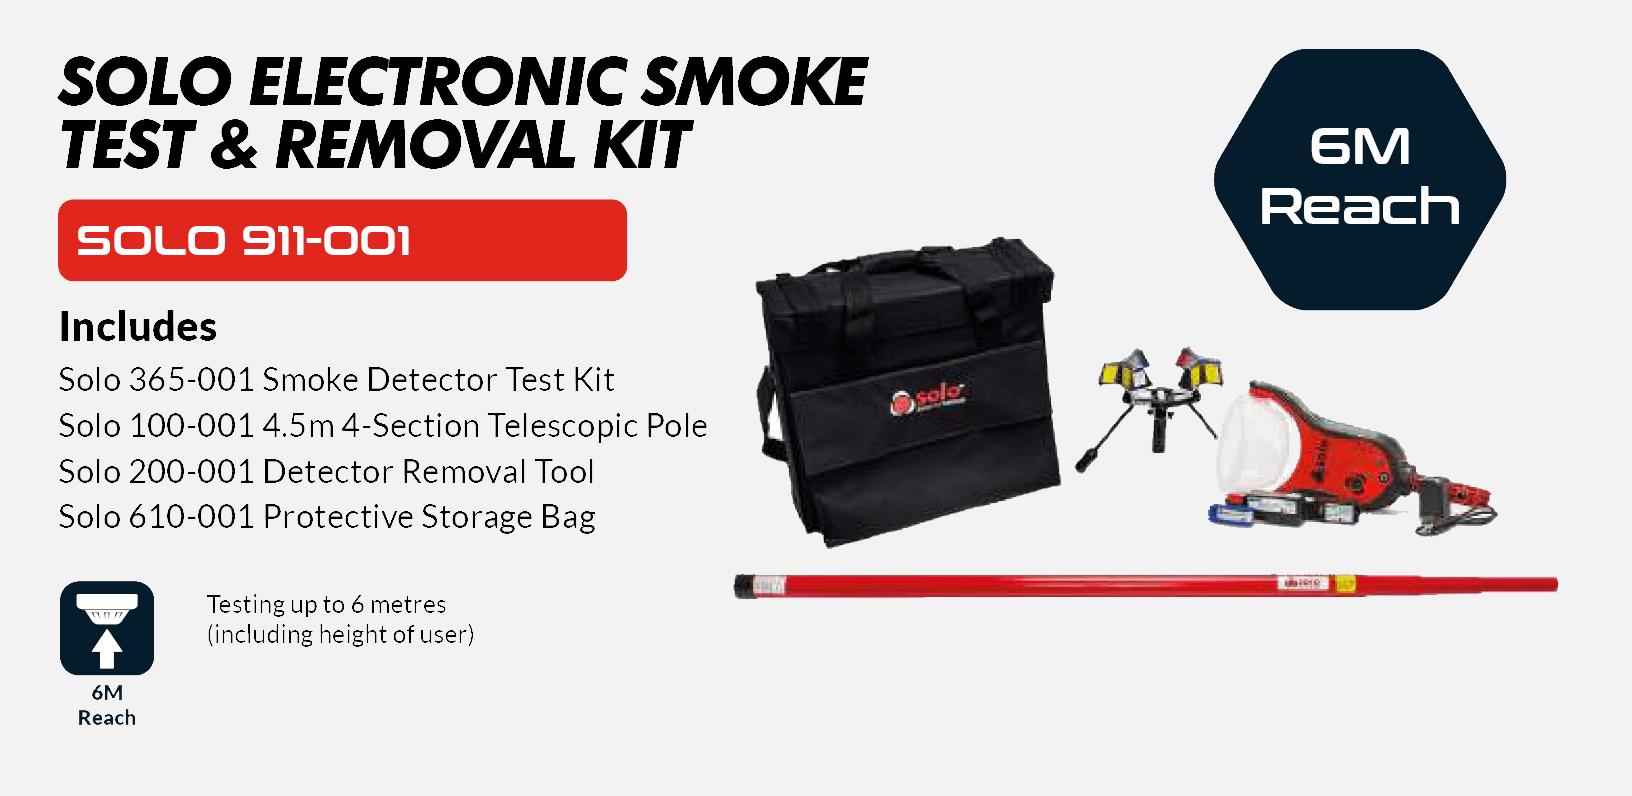 solo-detector-testers-testifire-no-climb-911-electronics-365-smoke-detector-test-kit-singapore